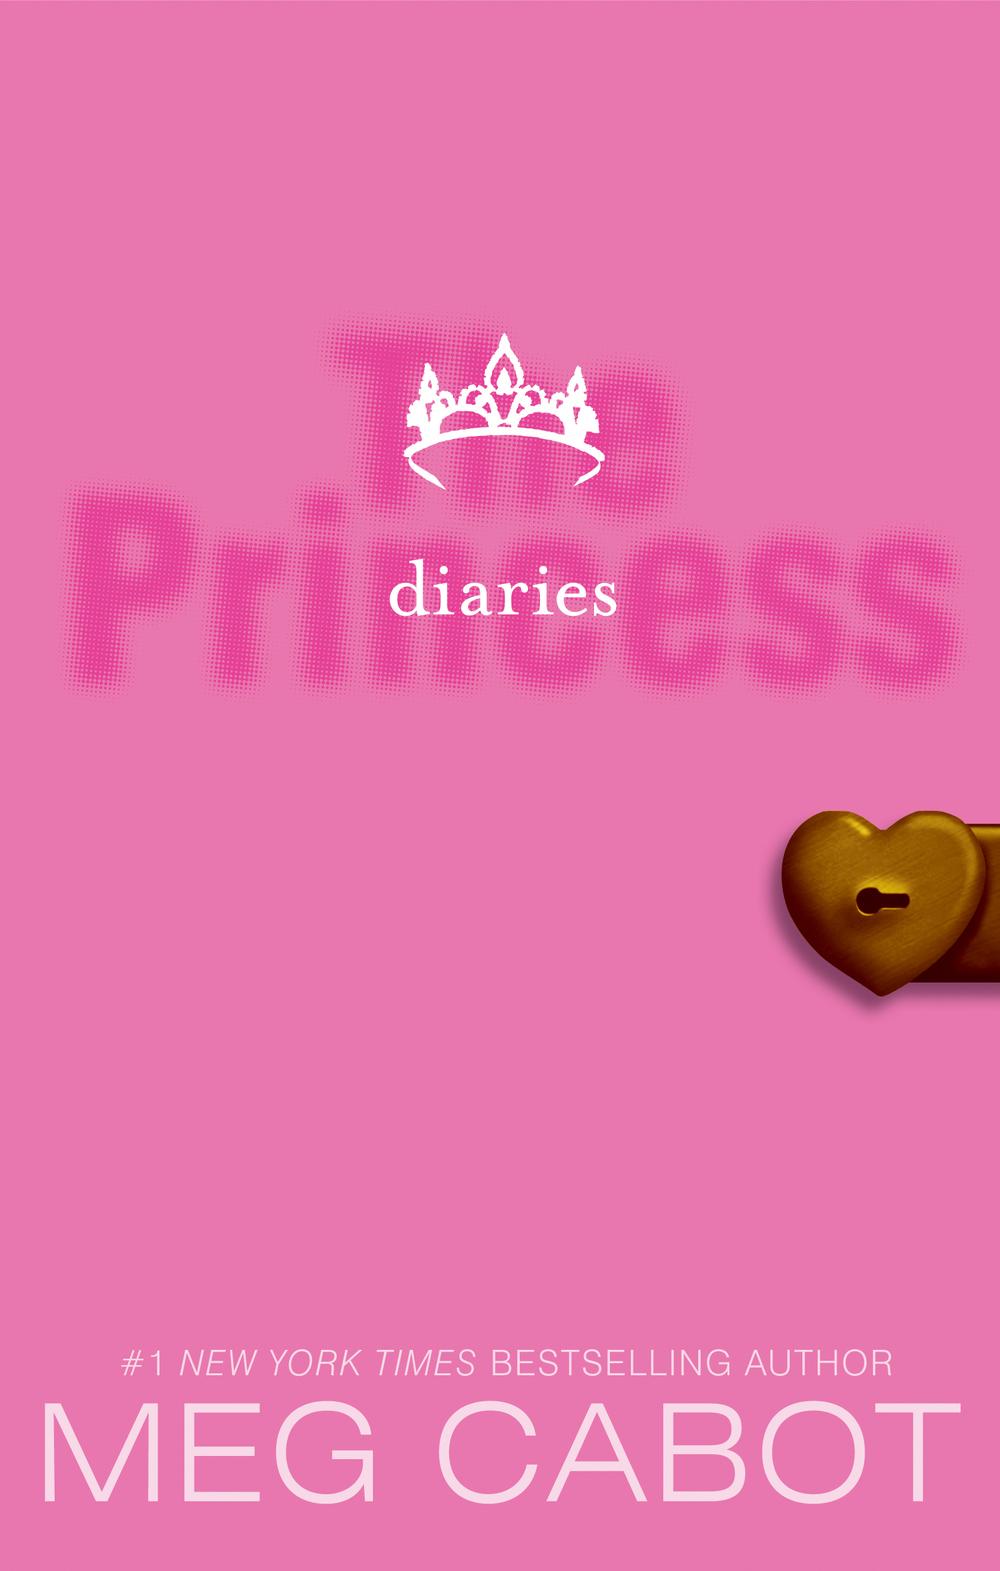 RayShappell_PrincessDiaries1.jpg